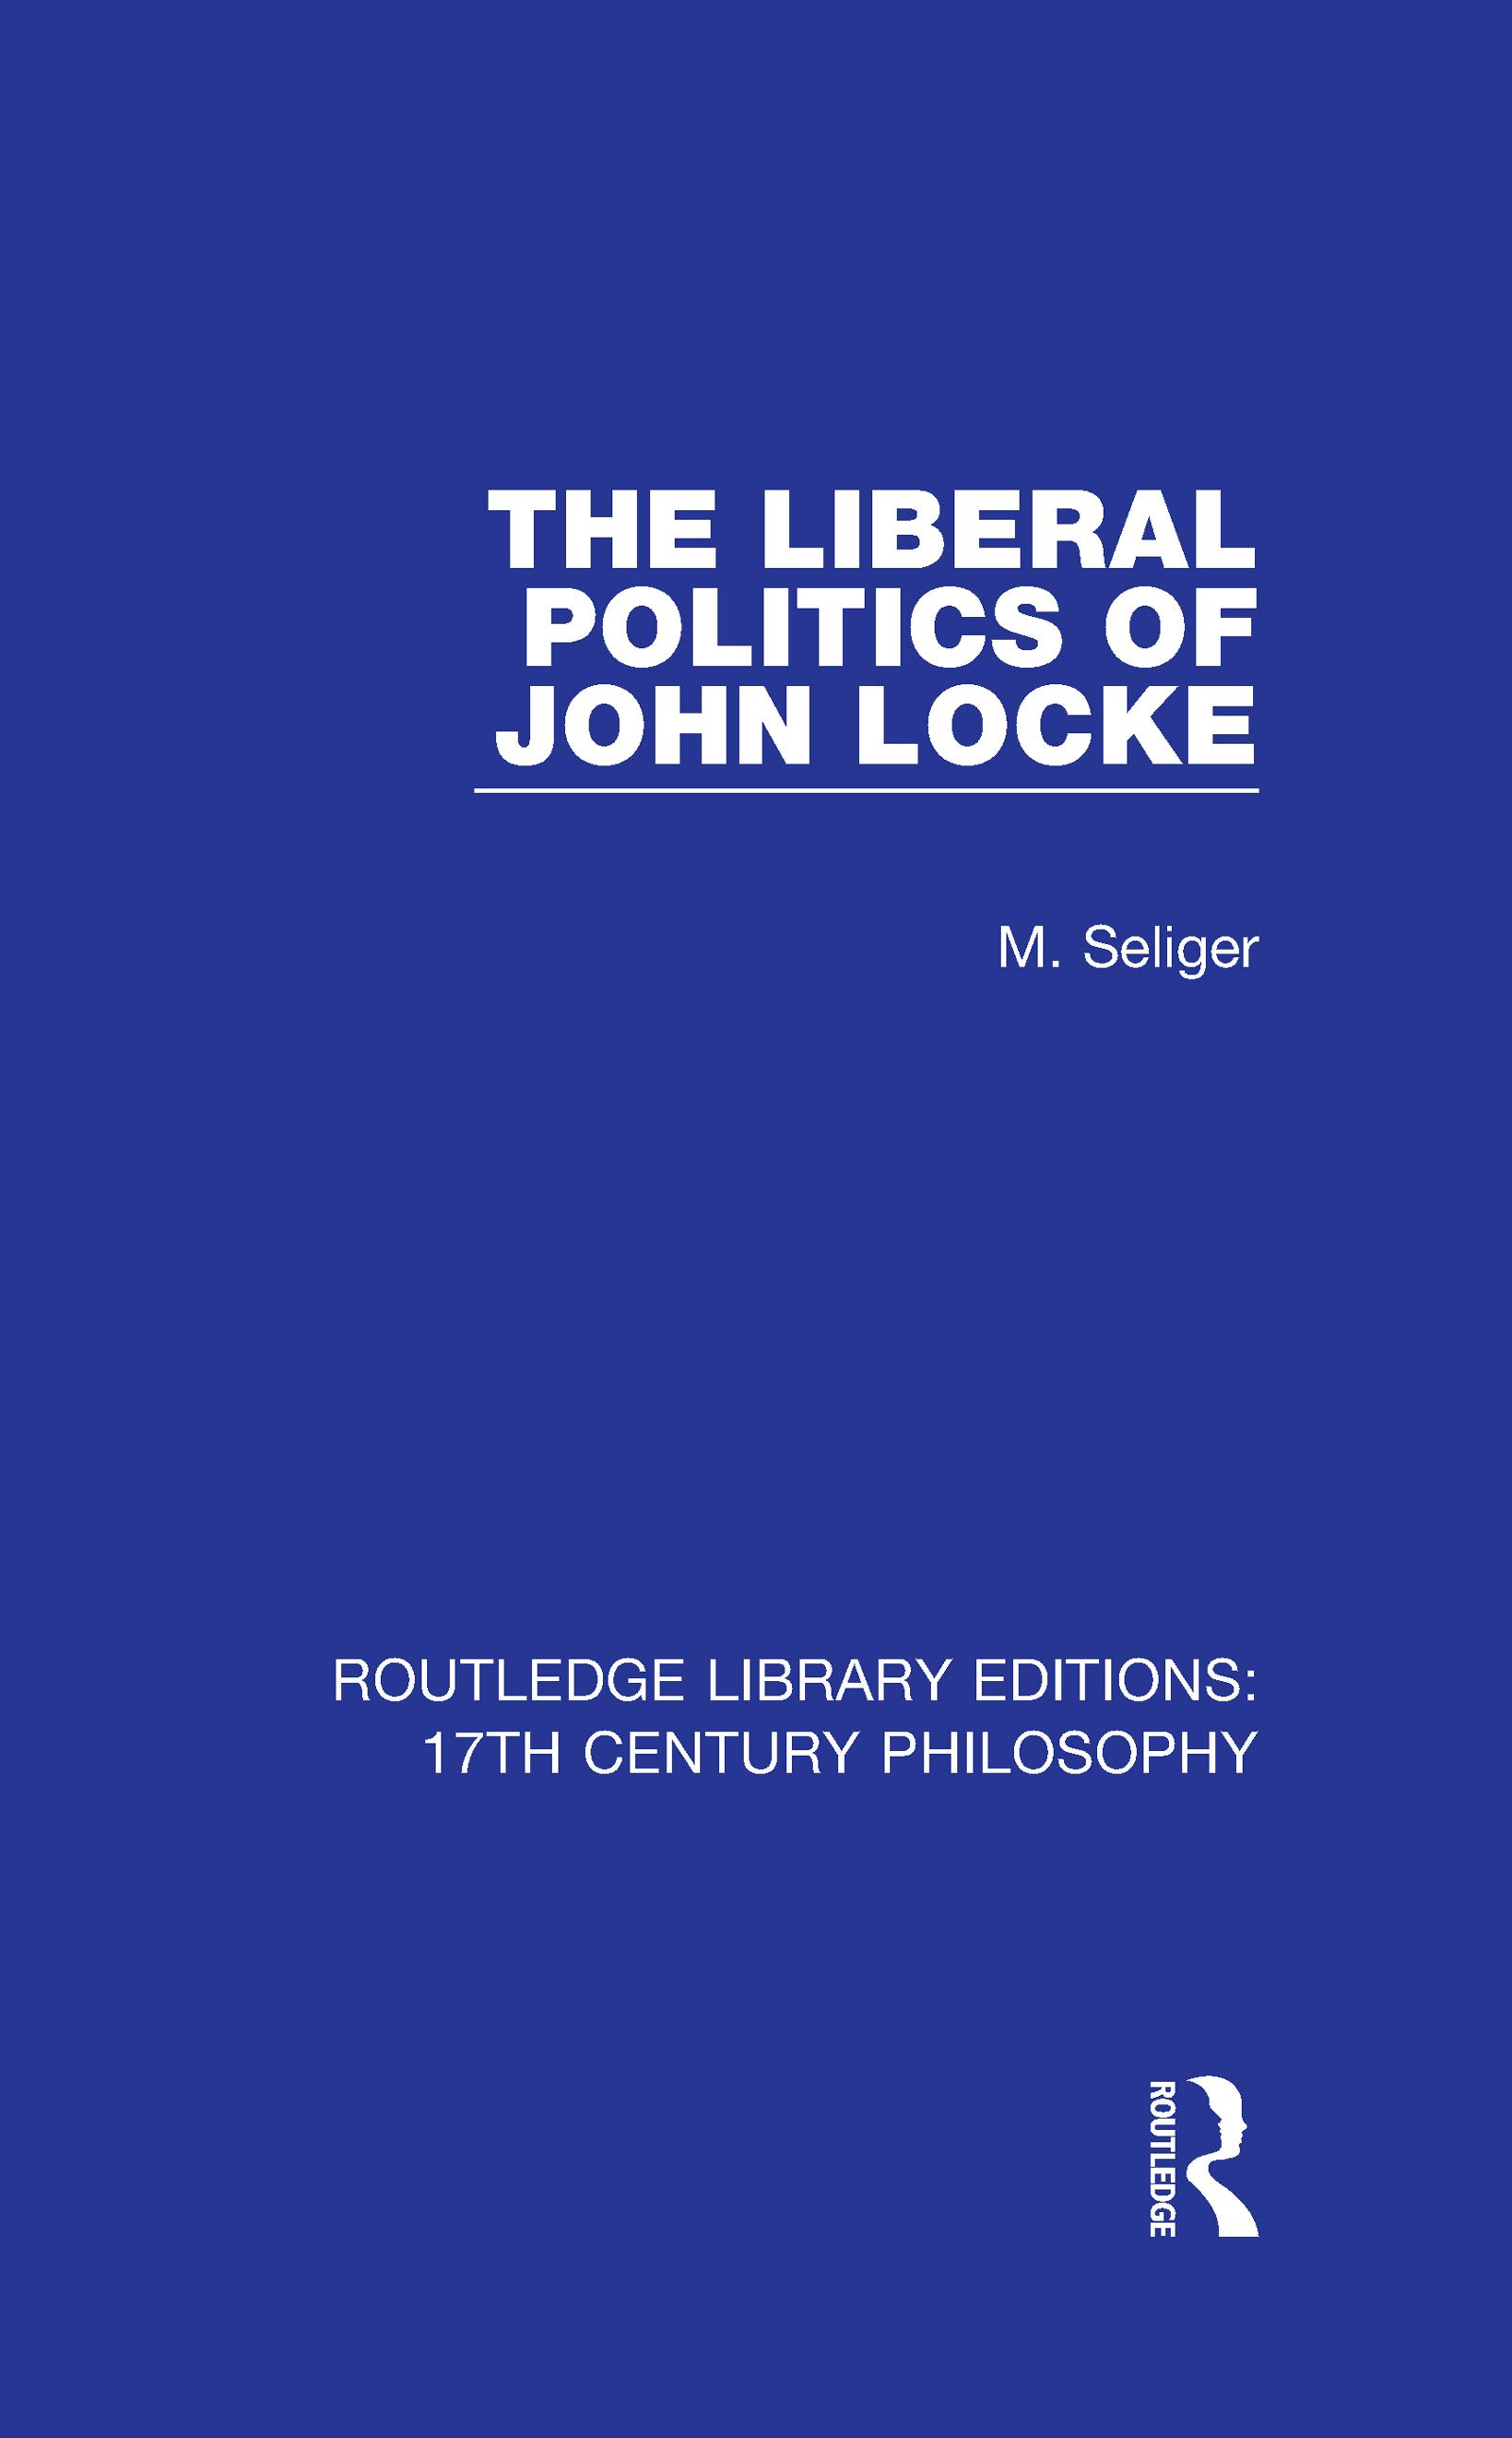 The Liberal Politics of John Locke